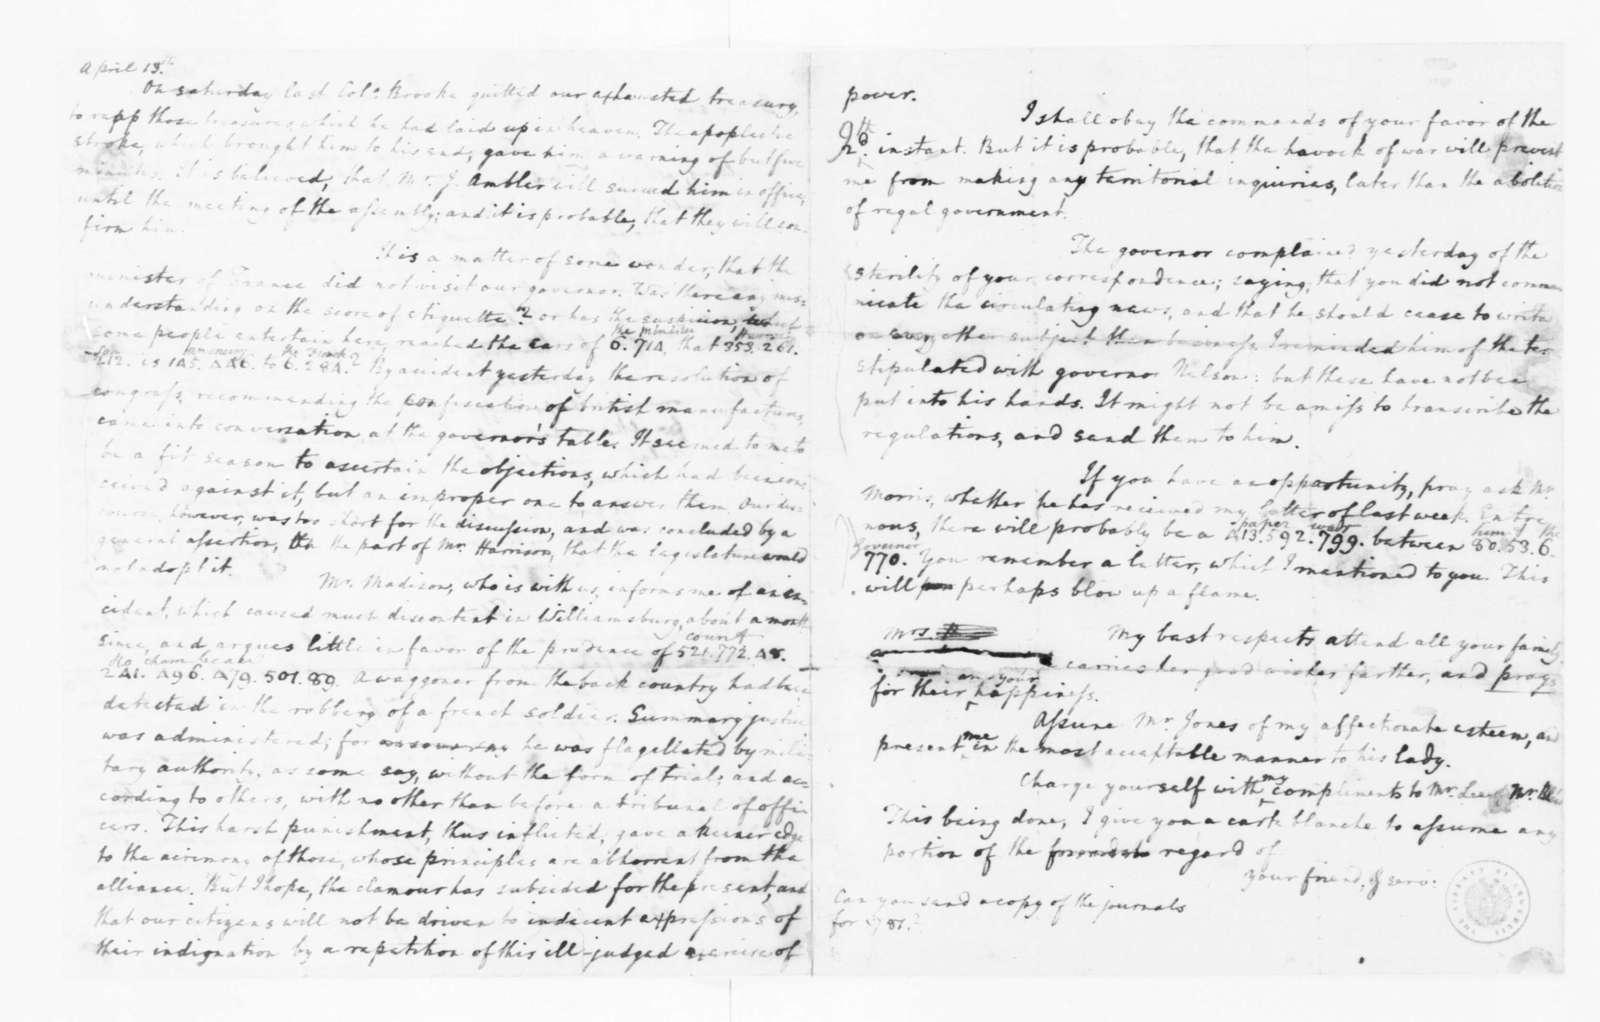 Edmund Randolph to James Madison, April 11, 1782.